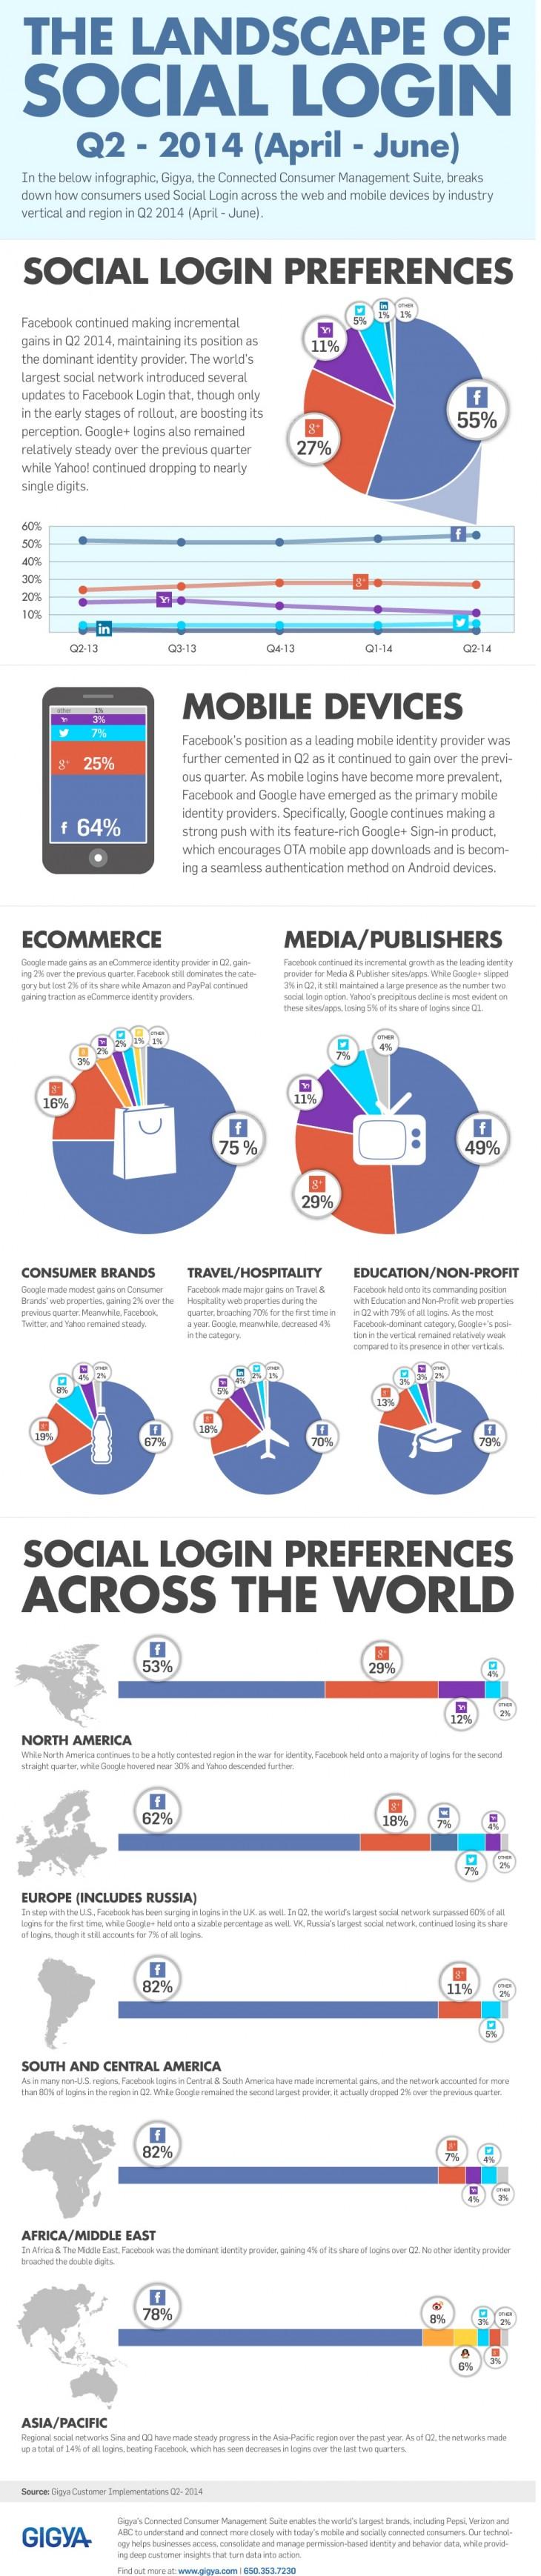 Social_Login_Data_Q2_2014_Gigya